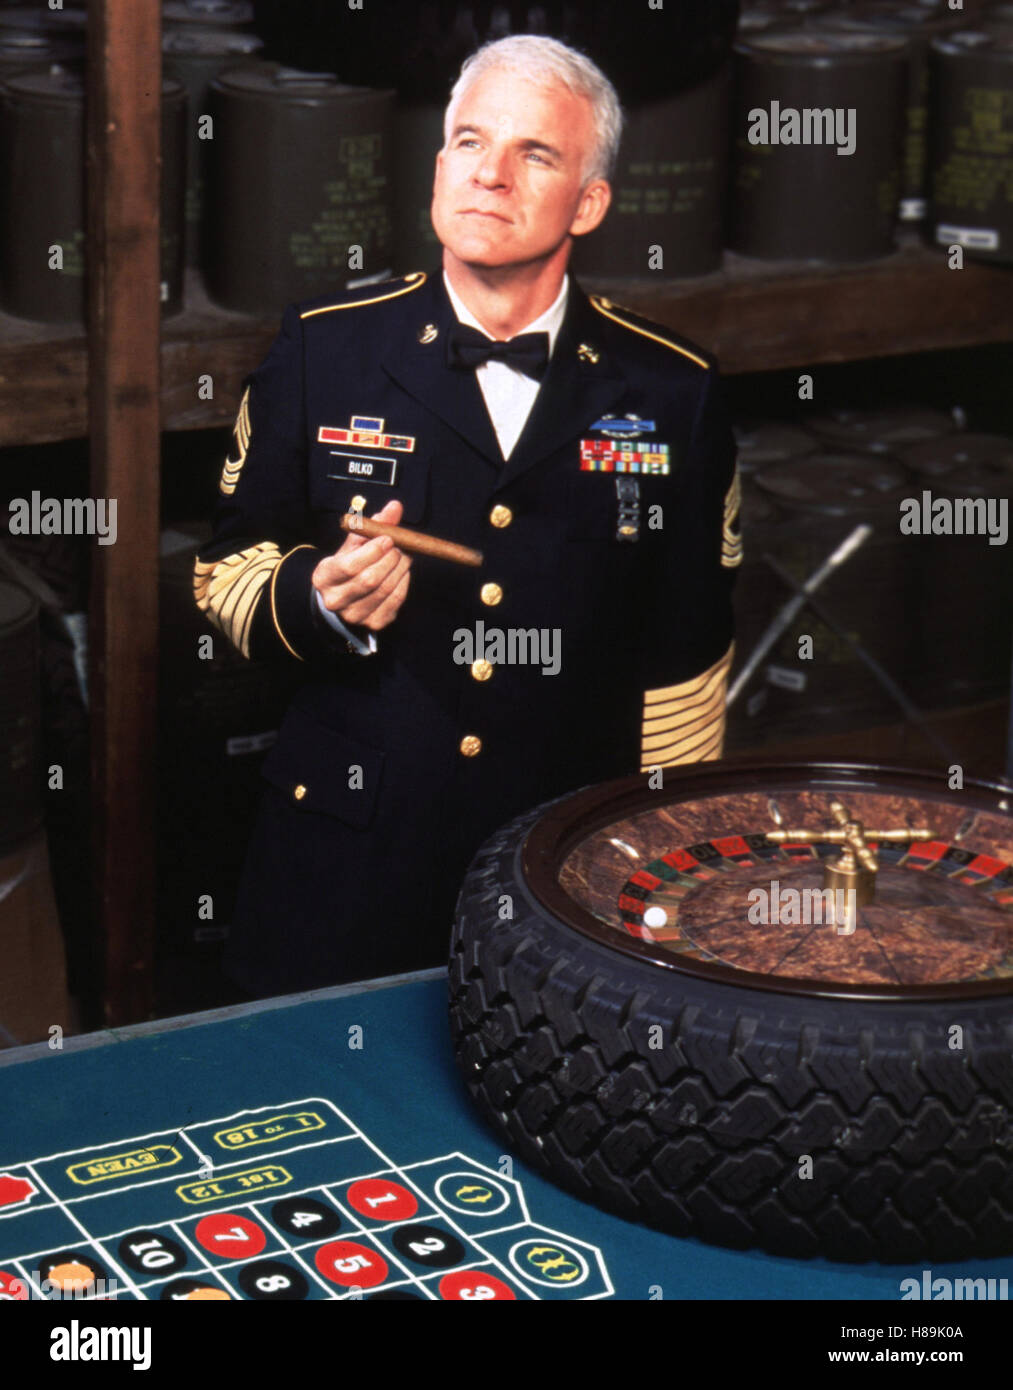 Immer Ärger mit Sergeant Bilko, (SGT. BILKO) USA 1996, Regie: Jonathan Lynn, STEVE MARTIN, Stichwort: Spielbank, - Stock Image